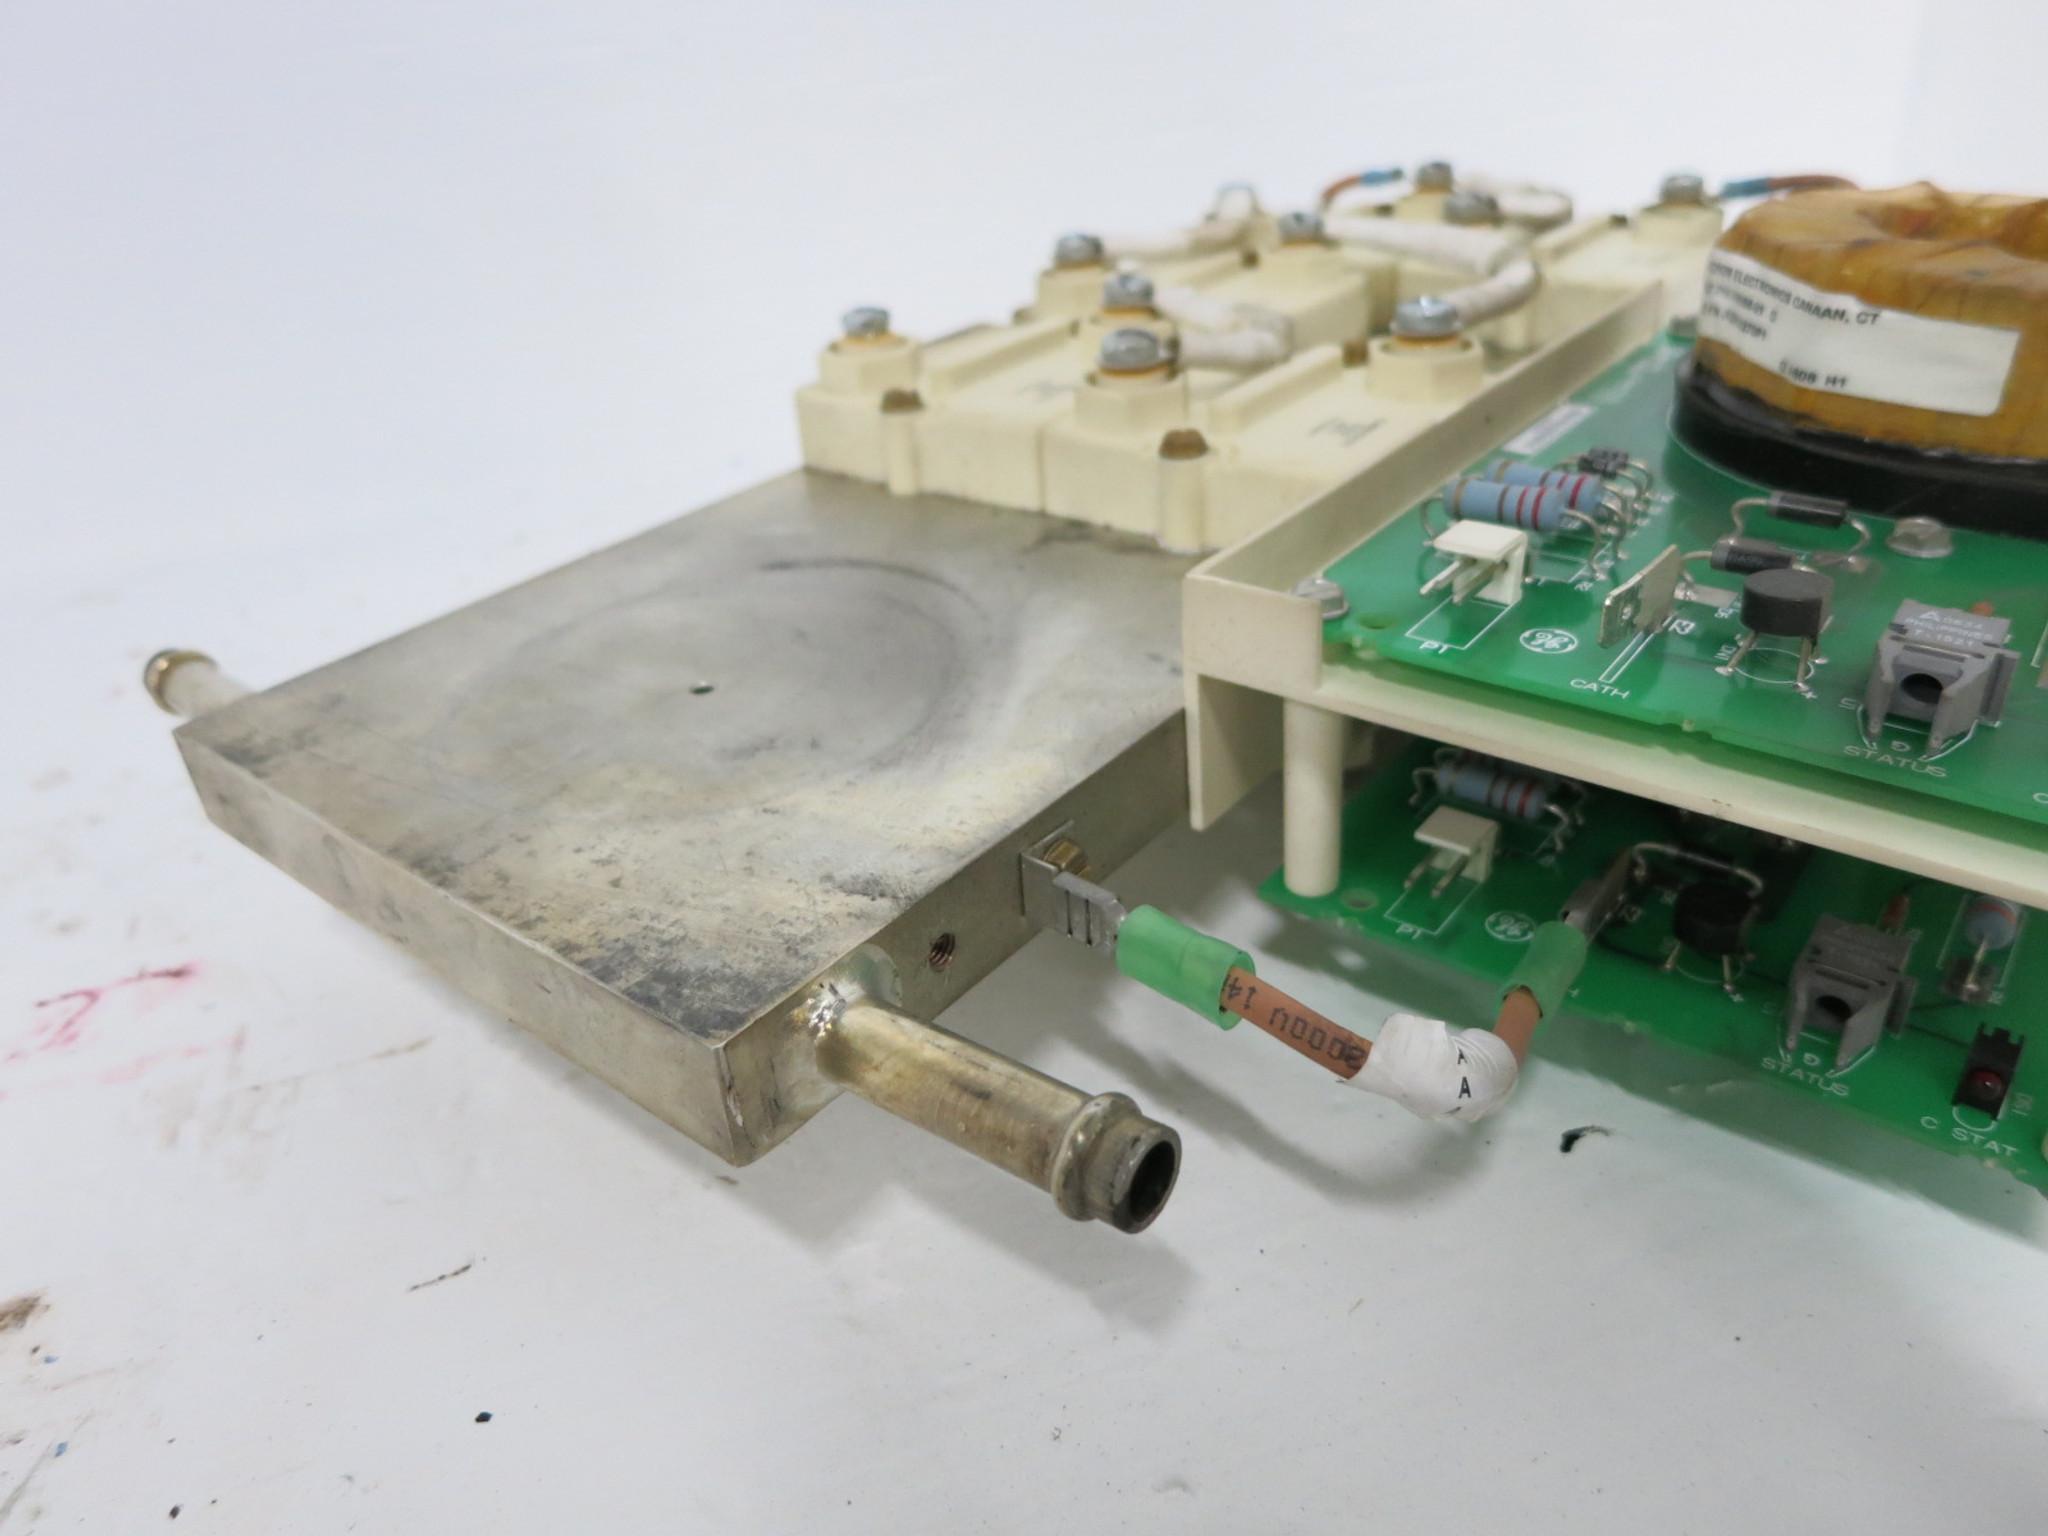 GE 173C9162ABG3 Thyristor Converter DS200-FHVA Heatsink SCR Bridge Power  Module (DW0964-12)